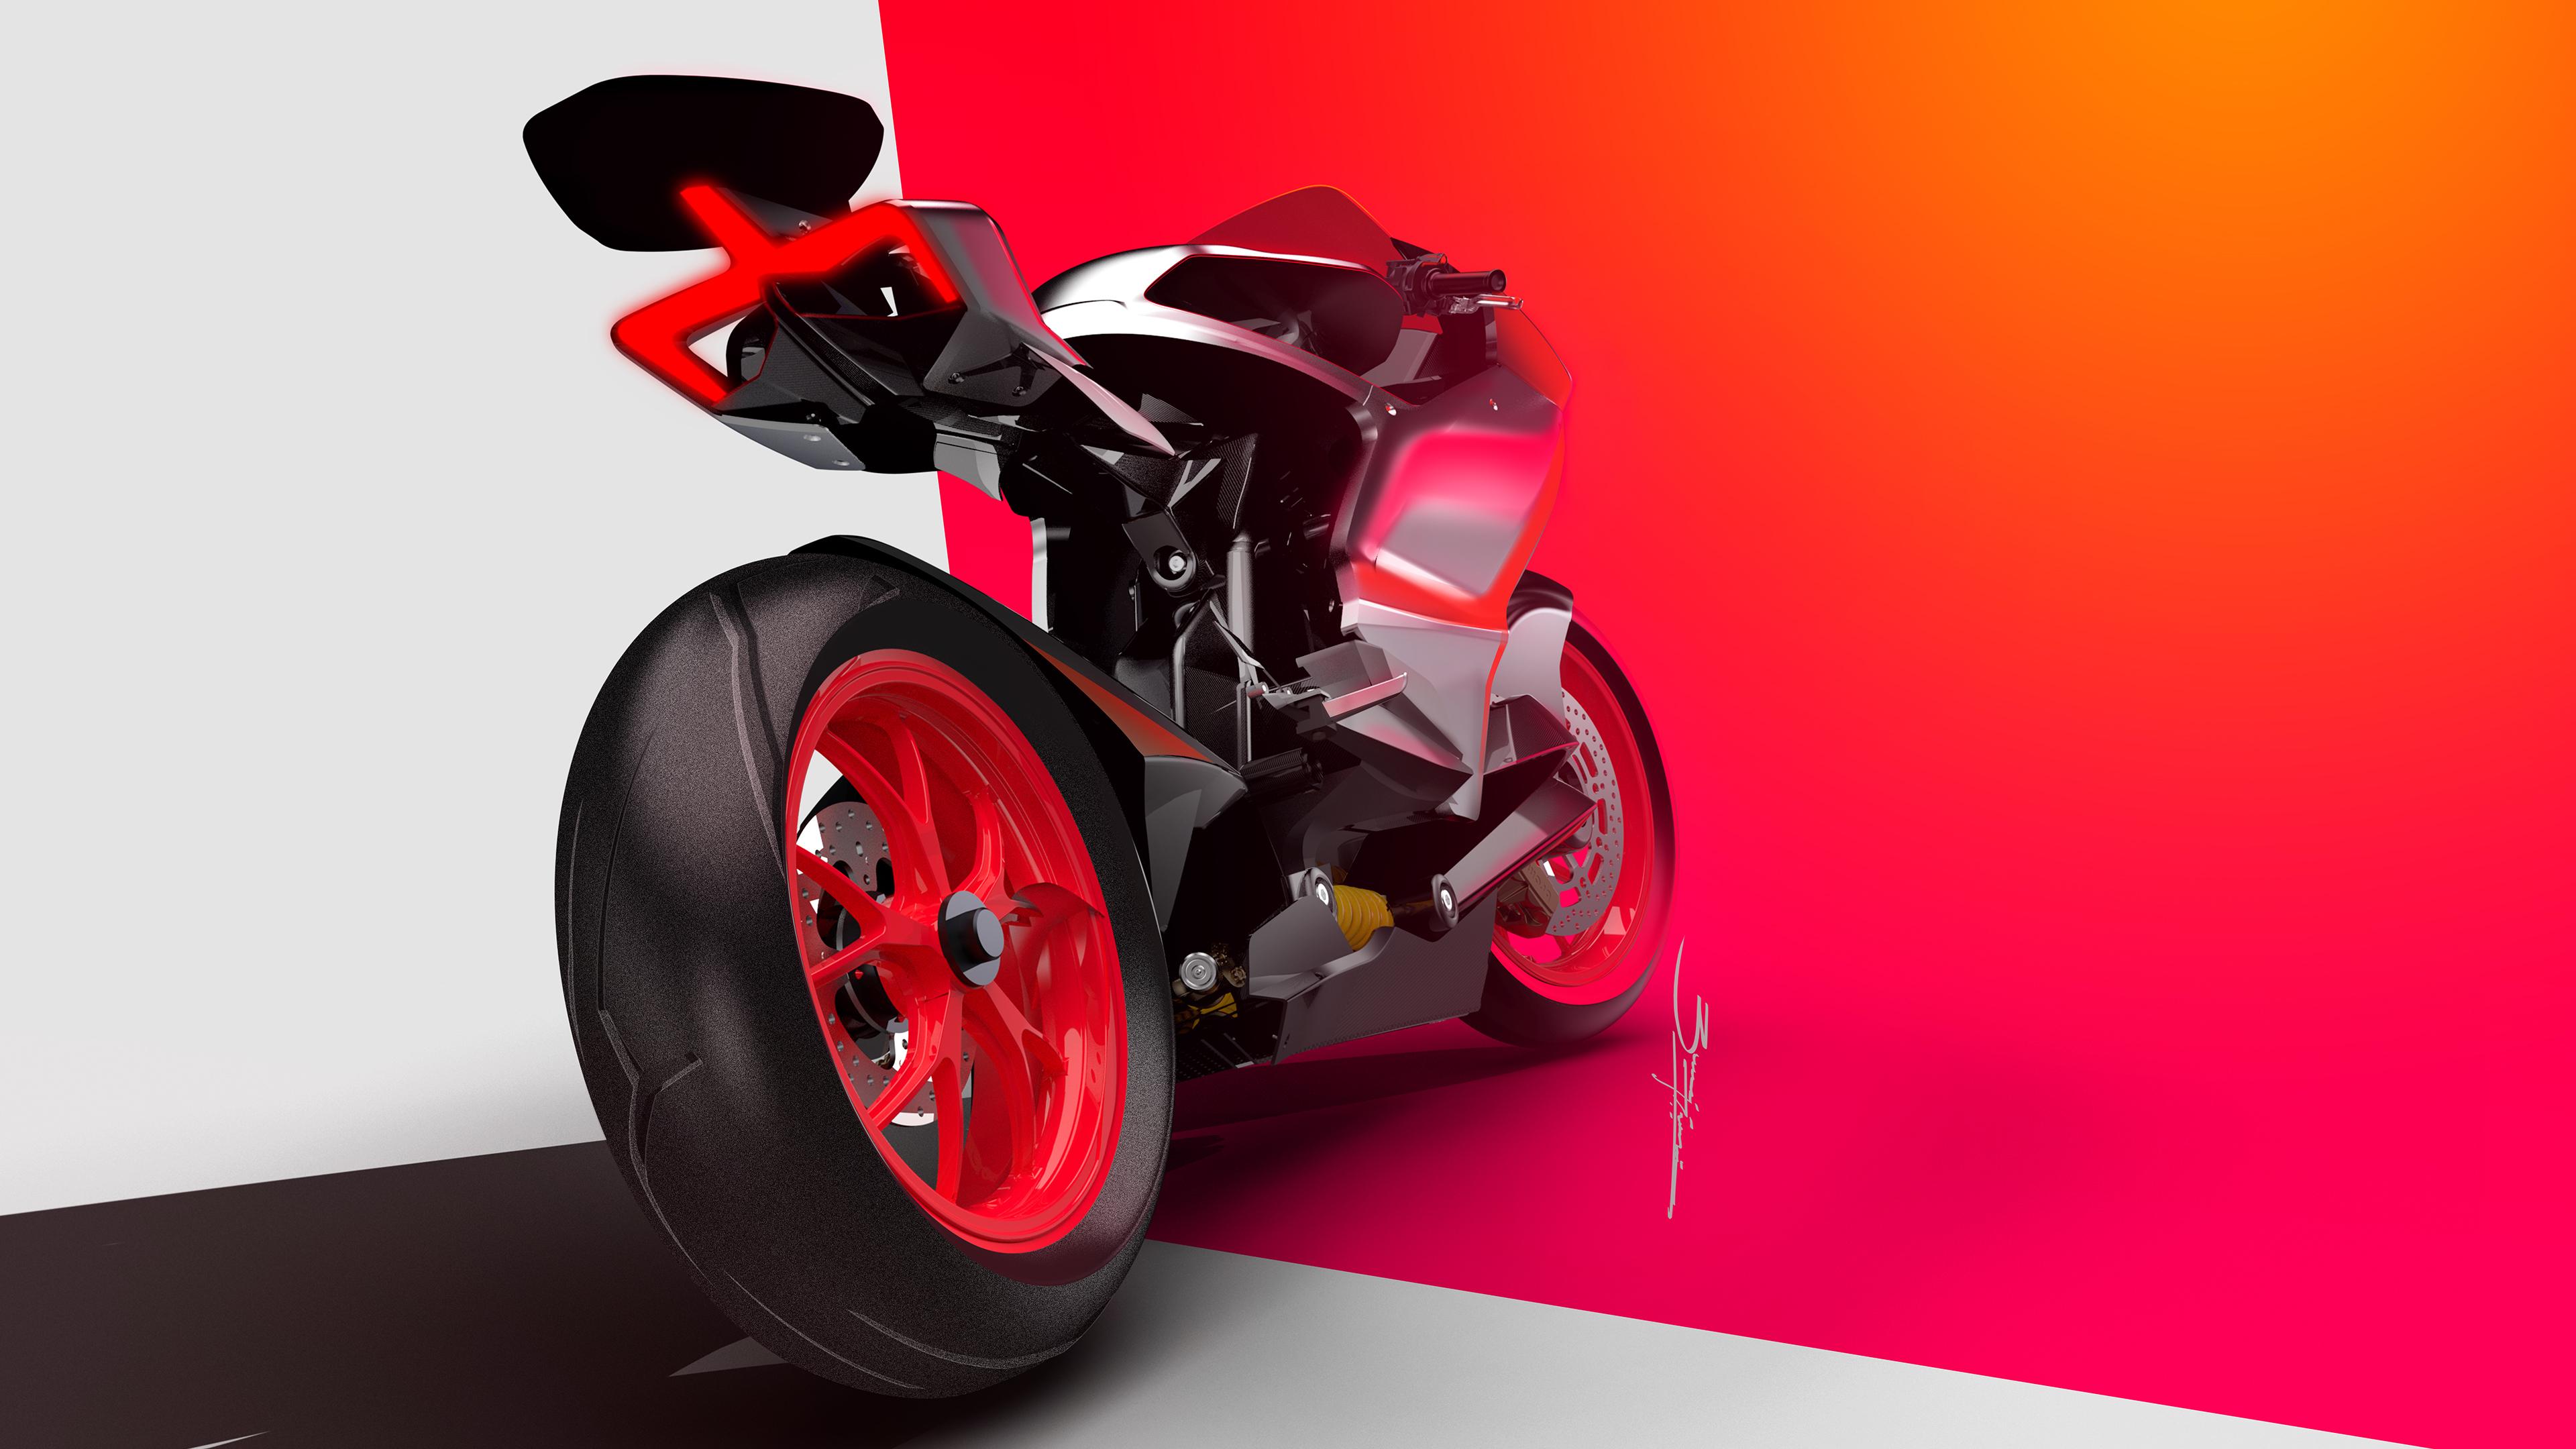 ducati zero electric 2020 rear 1536316619 - Ducati Zero Electric 2020 Rear - hd-wallpapers, ducati wallpapers, bikes wallpapers, behance wallpapers, artist wallpapers, 4k-wallpapers, 2020 bikes wallpapers